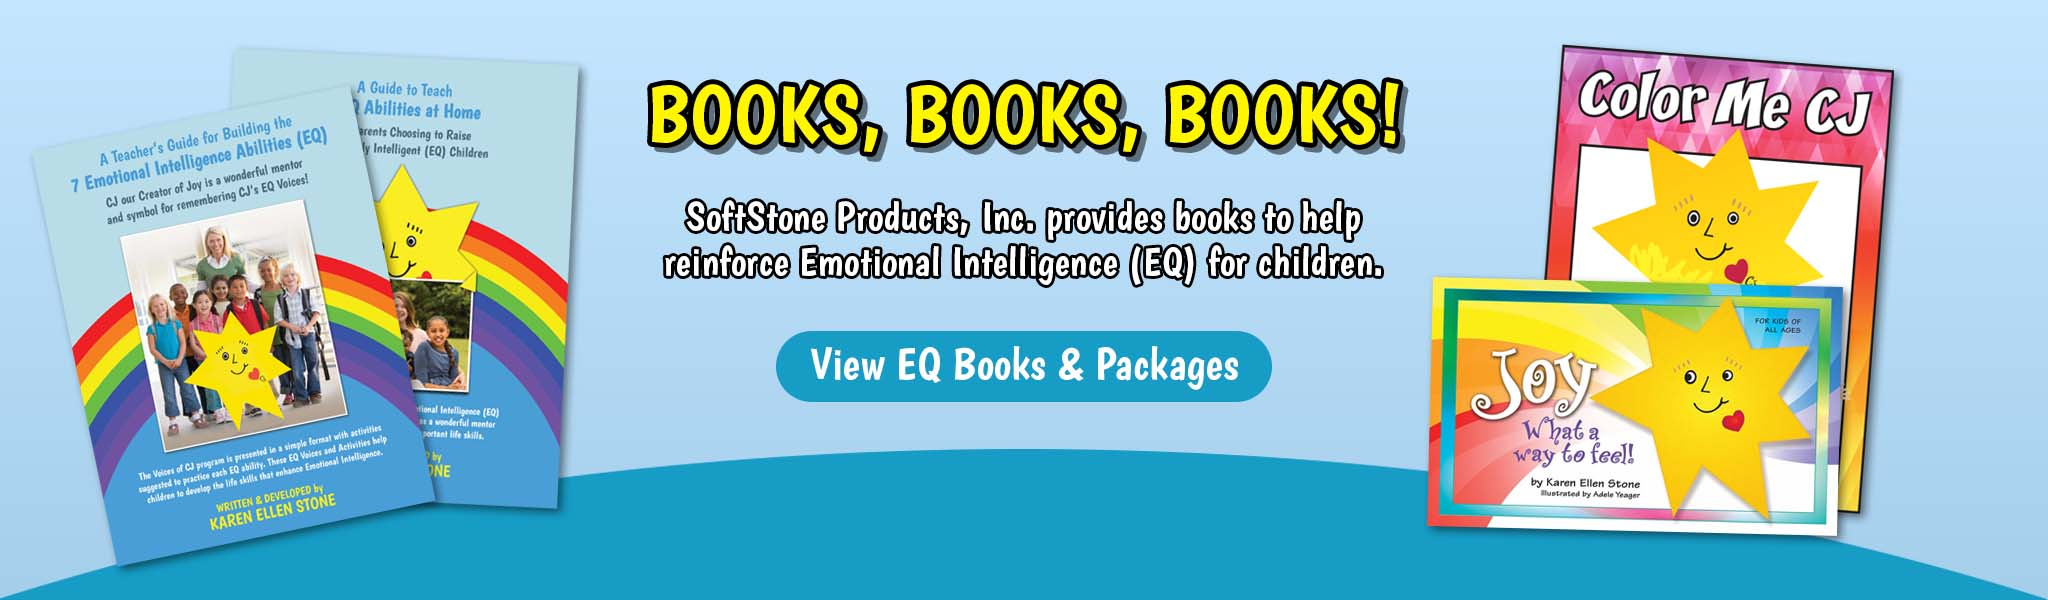 Books Books Books - Banner